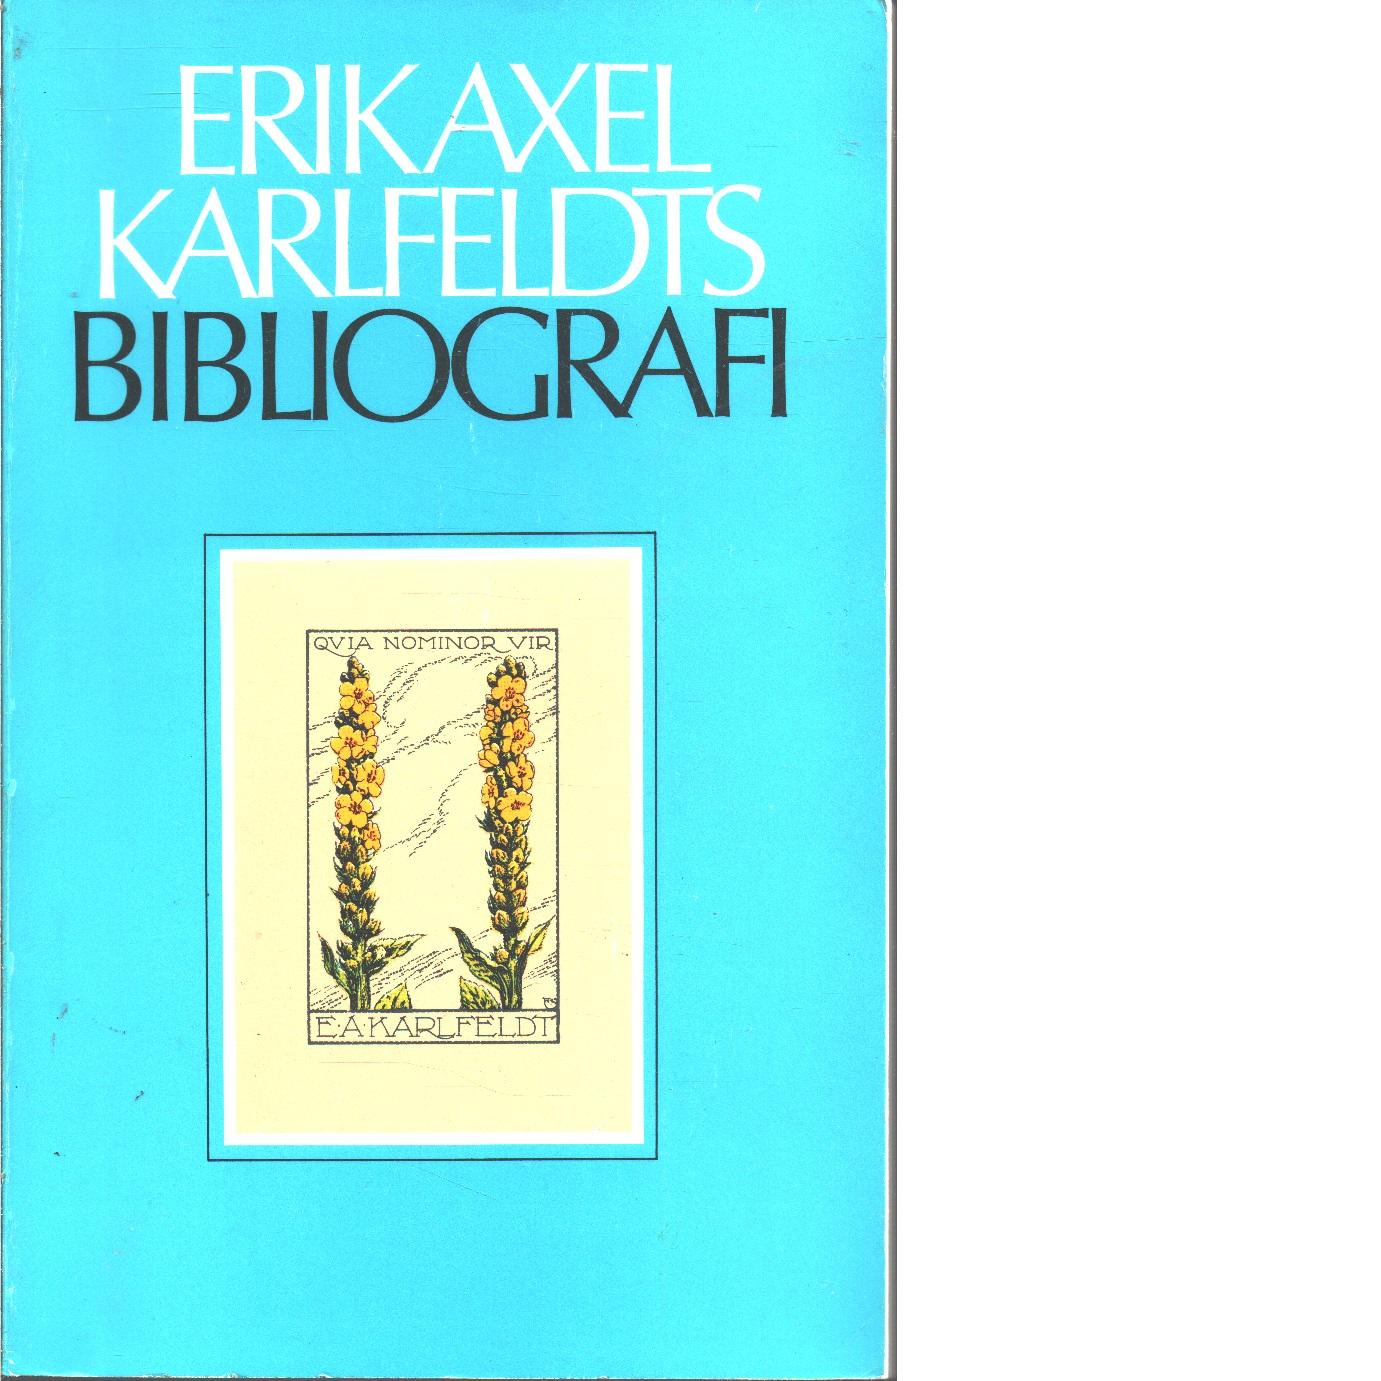 Erik Axel Karlfeldts bibliografi [D. 1] - Afzelius, Nils och Bergstrand, Arne